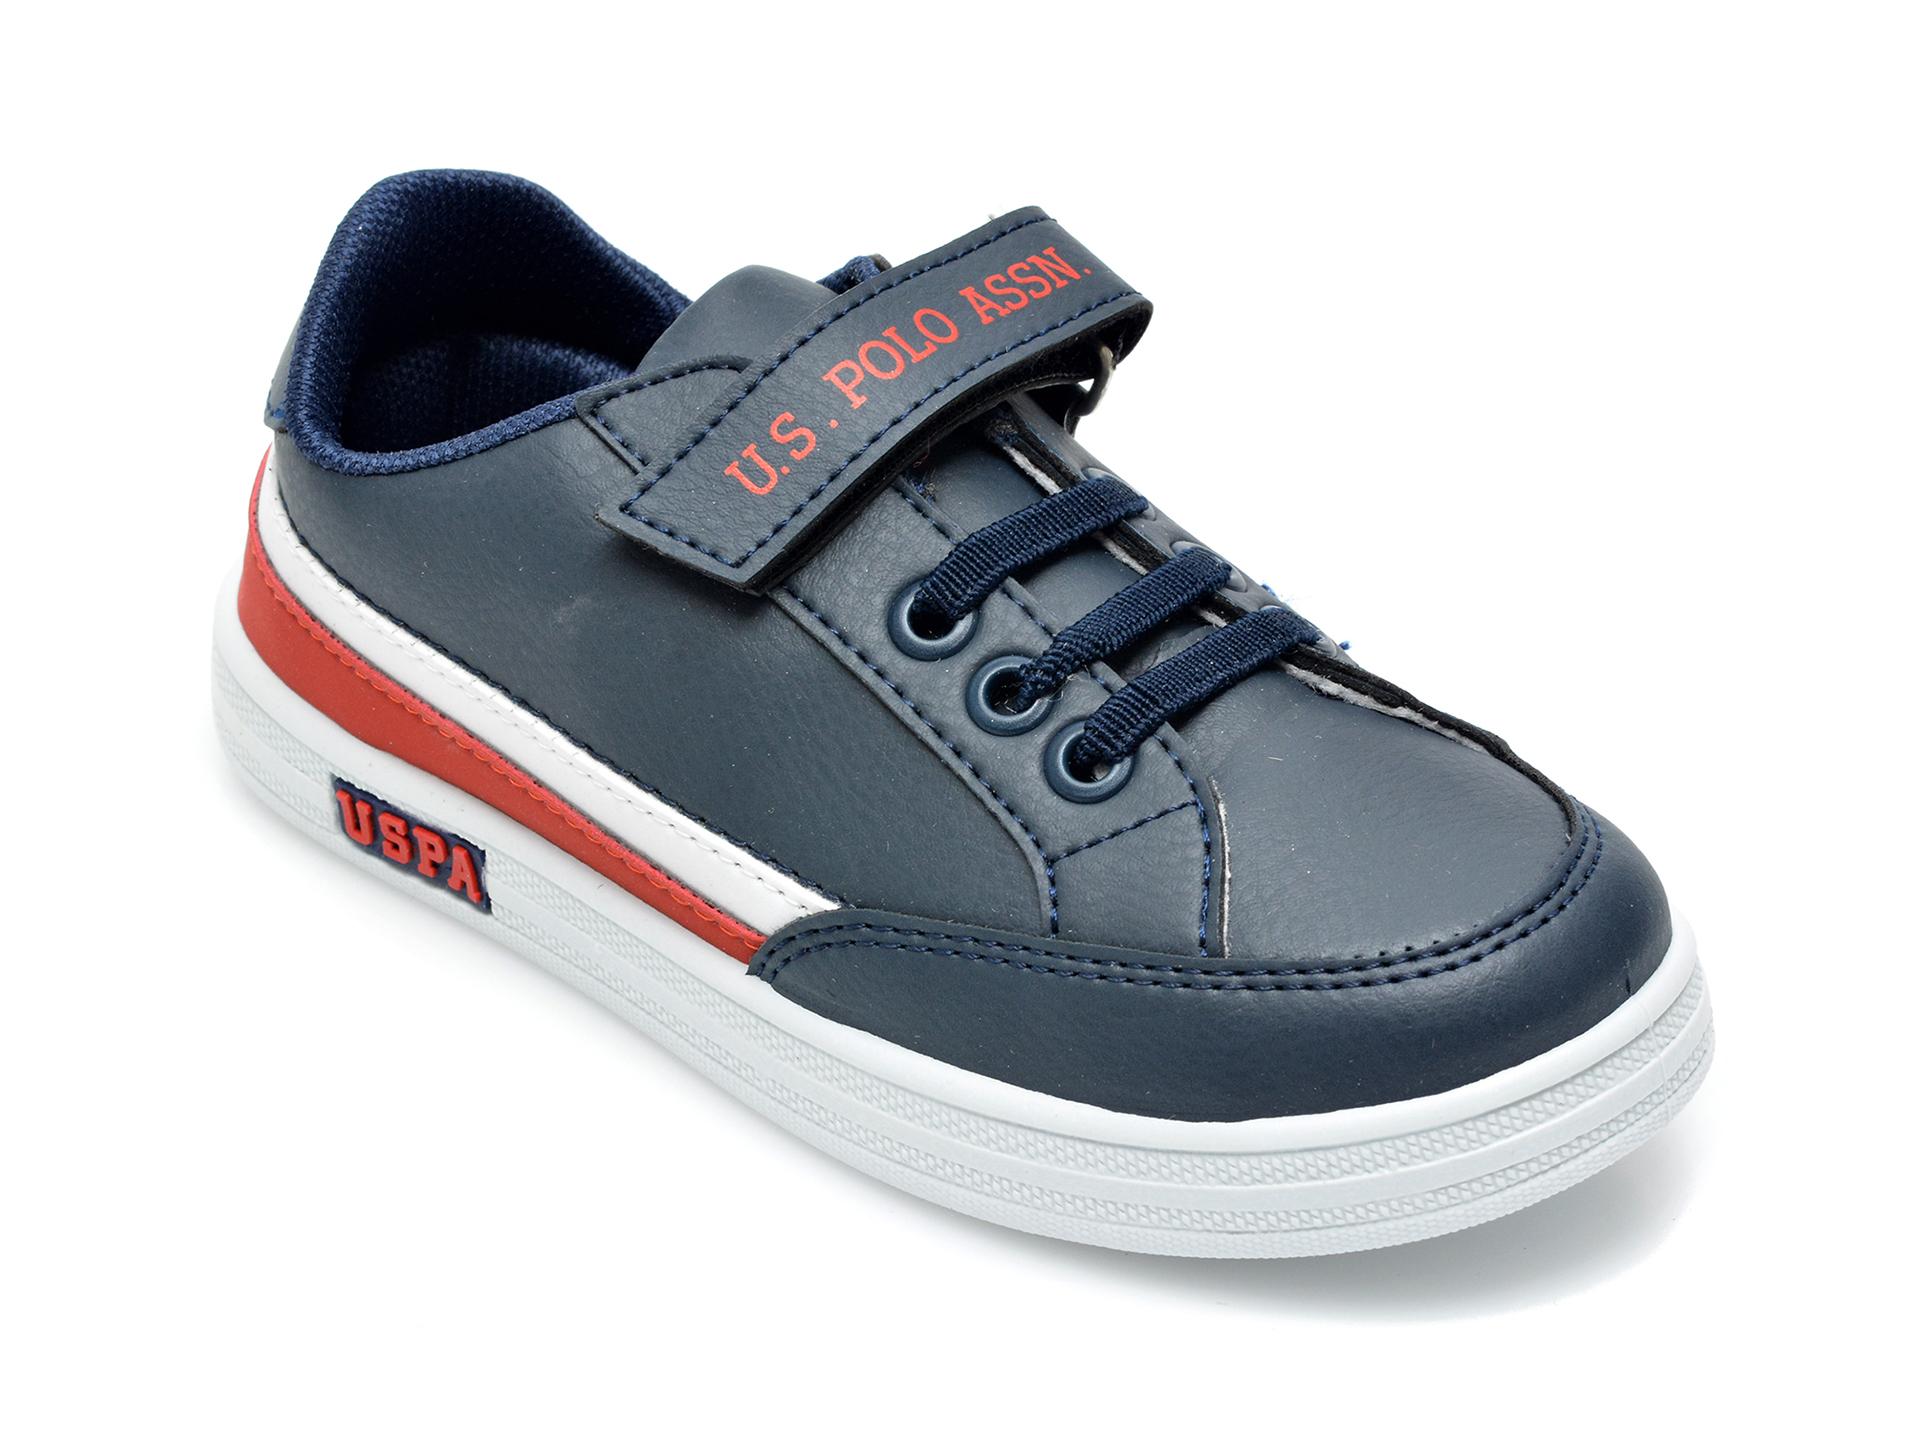 Pantofi sport US POLO ASSN bleumarin, JAMA1FX, din piele ecologica